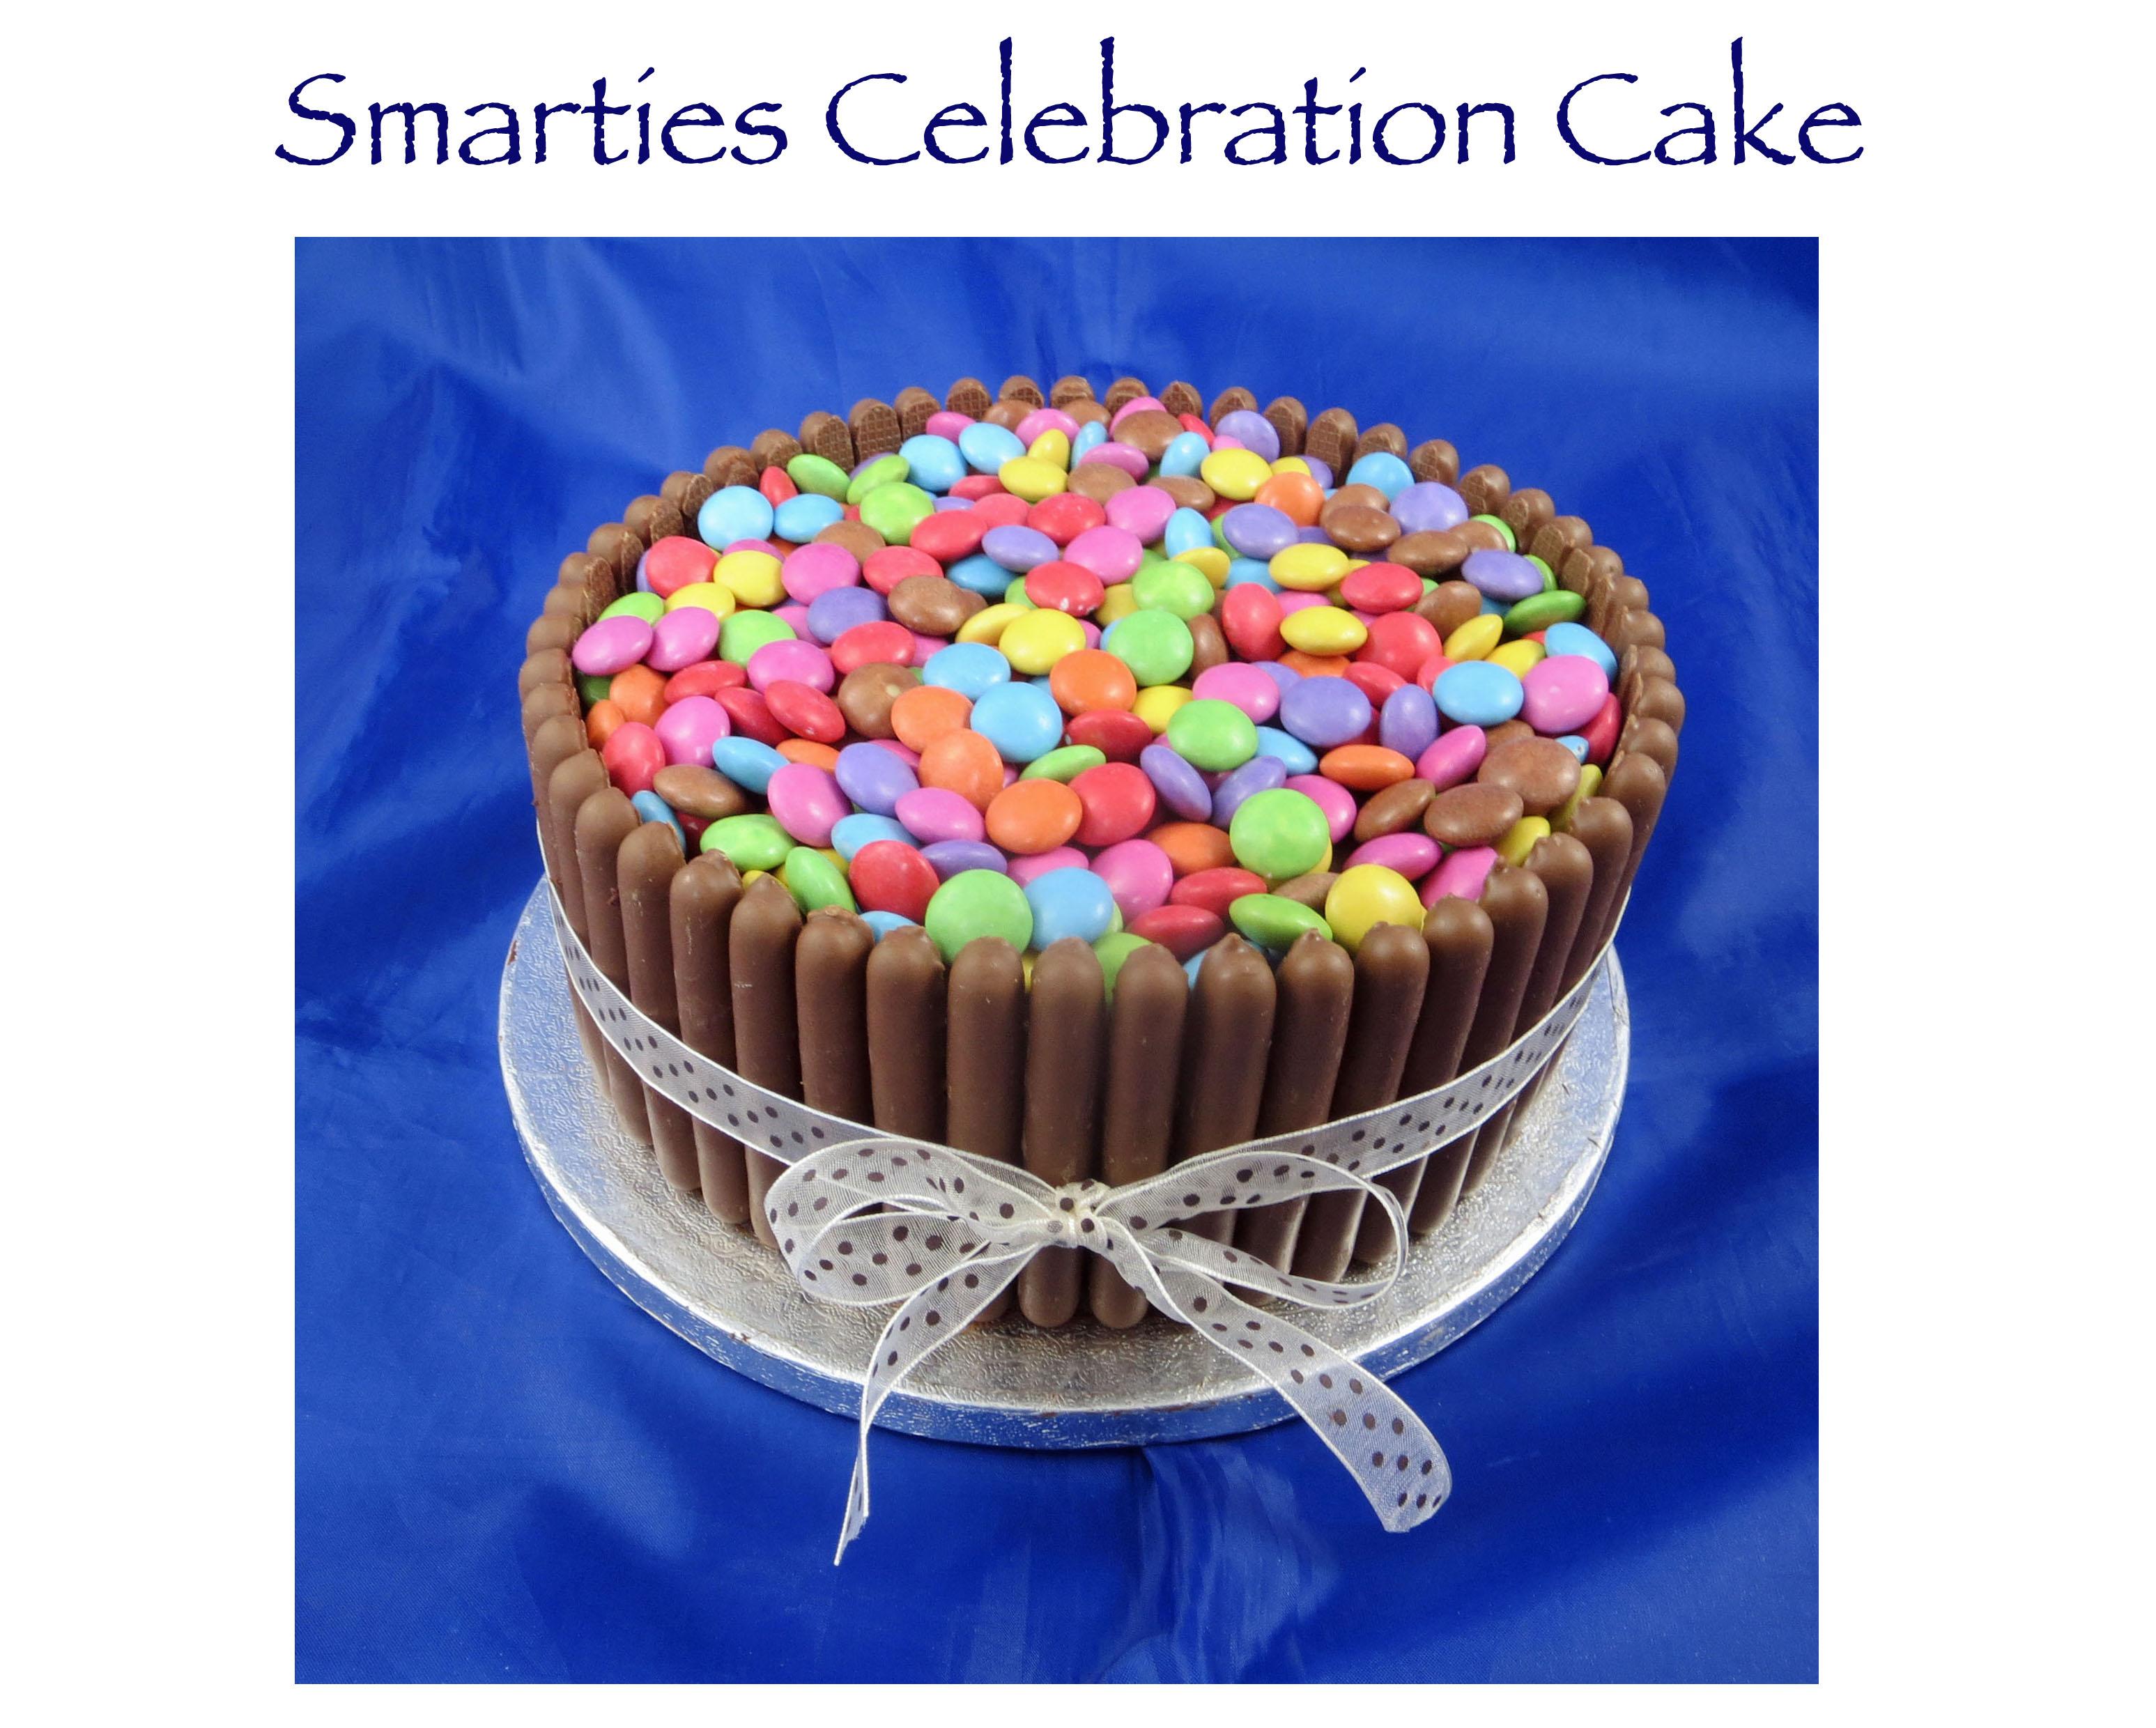 Smarties Celebration Cake